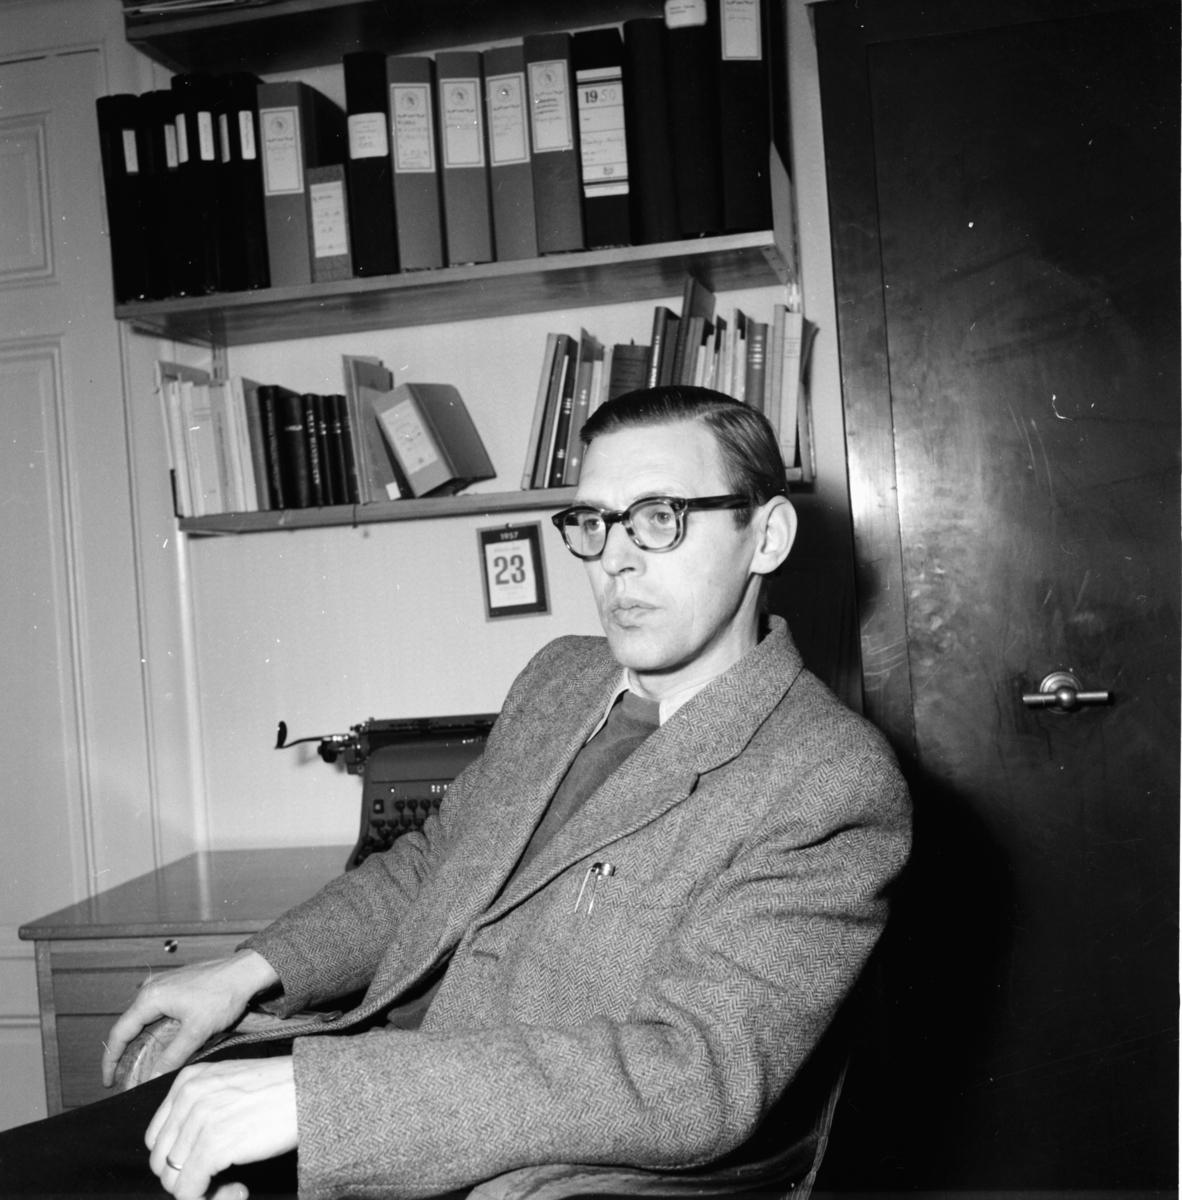 Kyrkoherde Åke Wermaeus i prästgården i Los 1958.